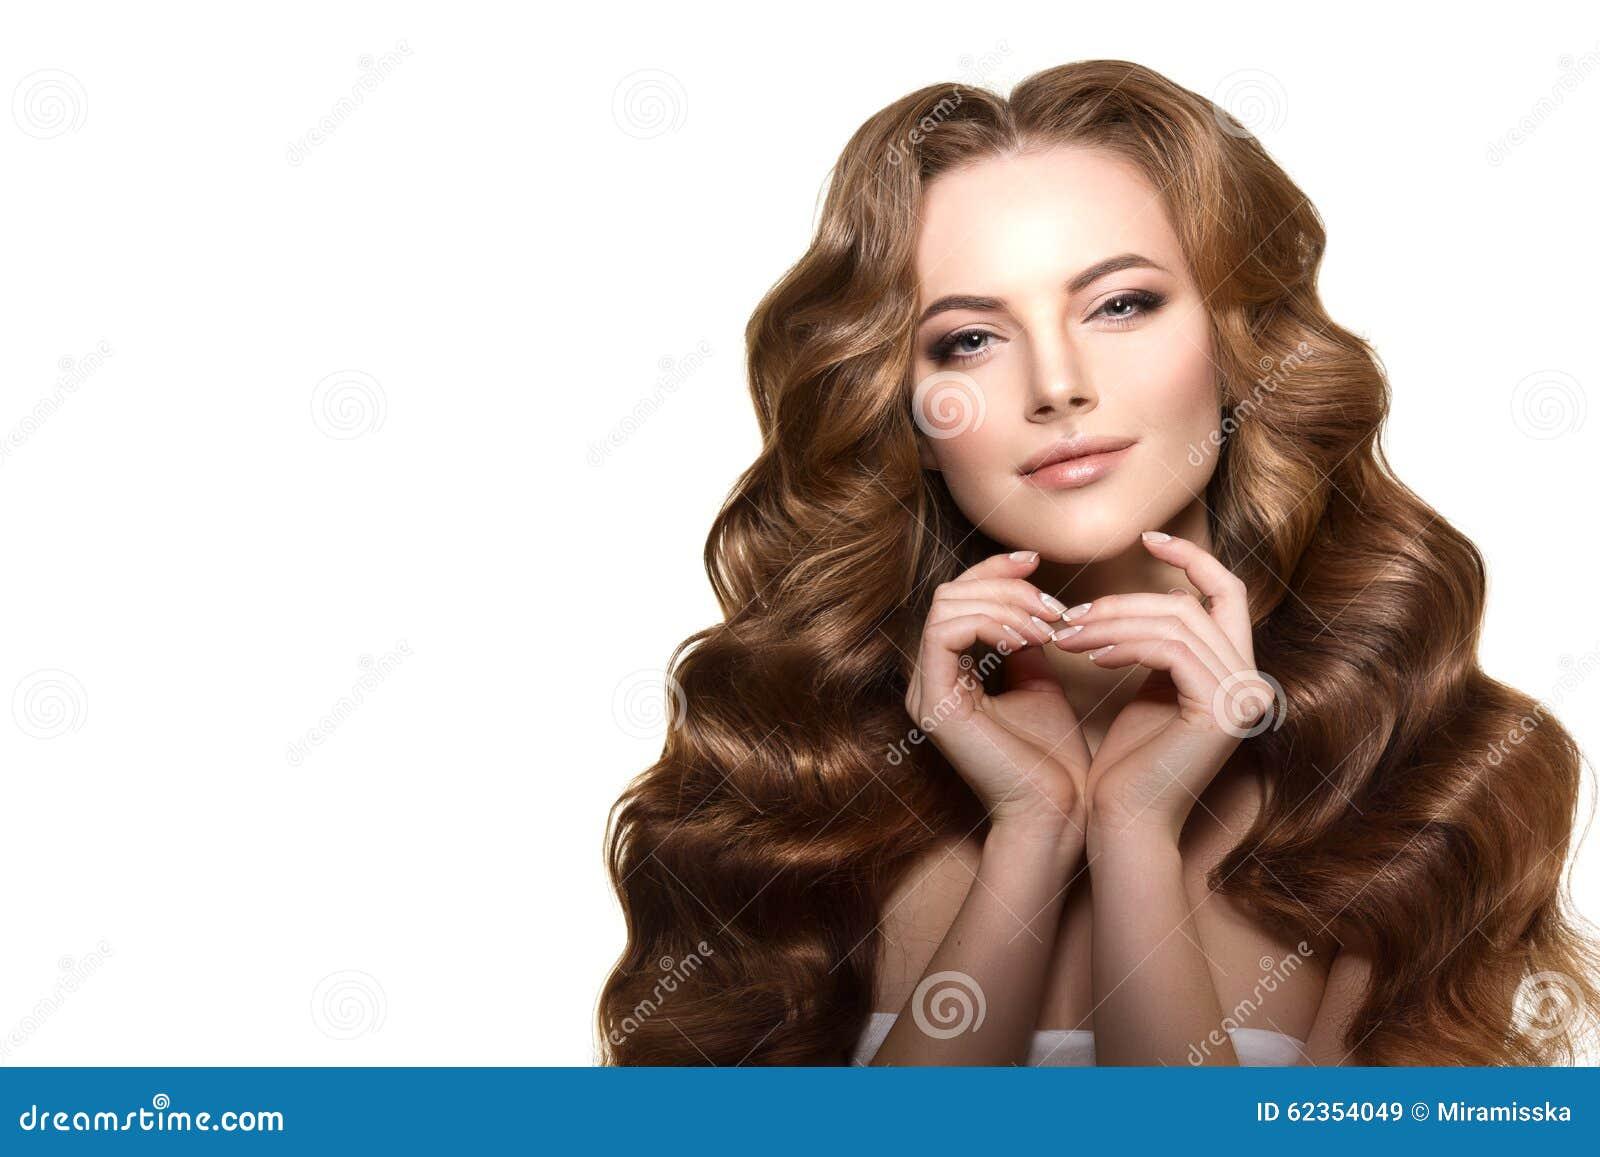 Salon Fashion Hair Model Stock Images Photos - Haircut girl model